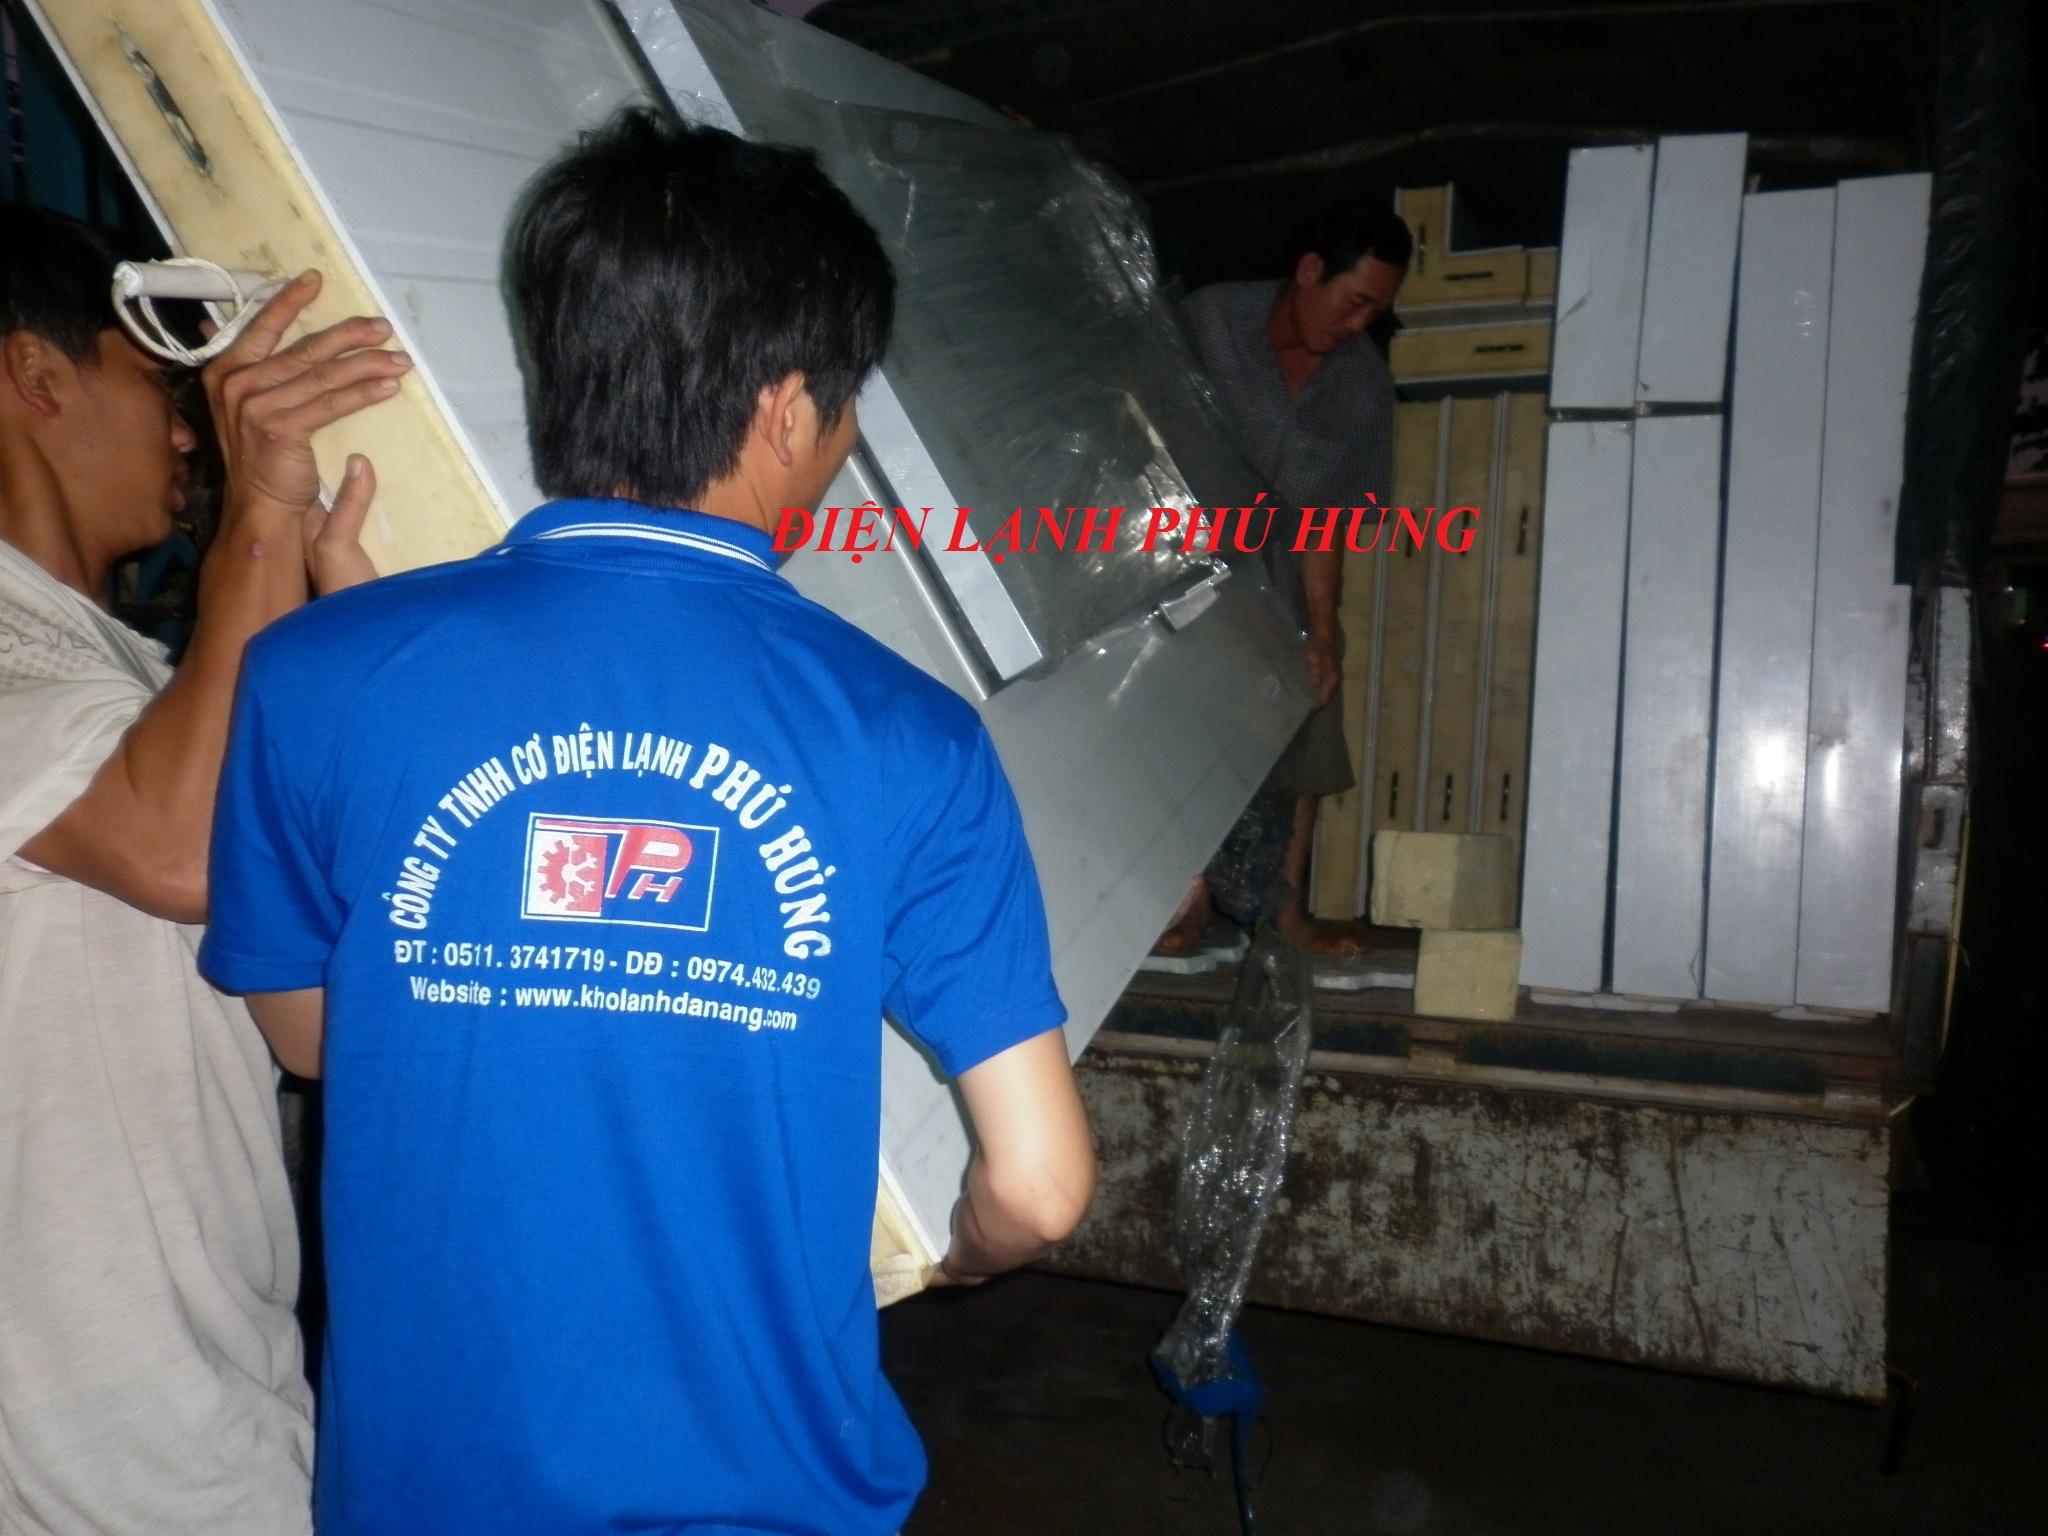 vm aaP8 - Kho lạnh bảo quản Sữa Chua tại Tam Kỳ